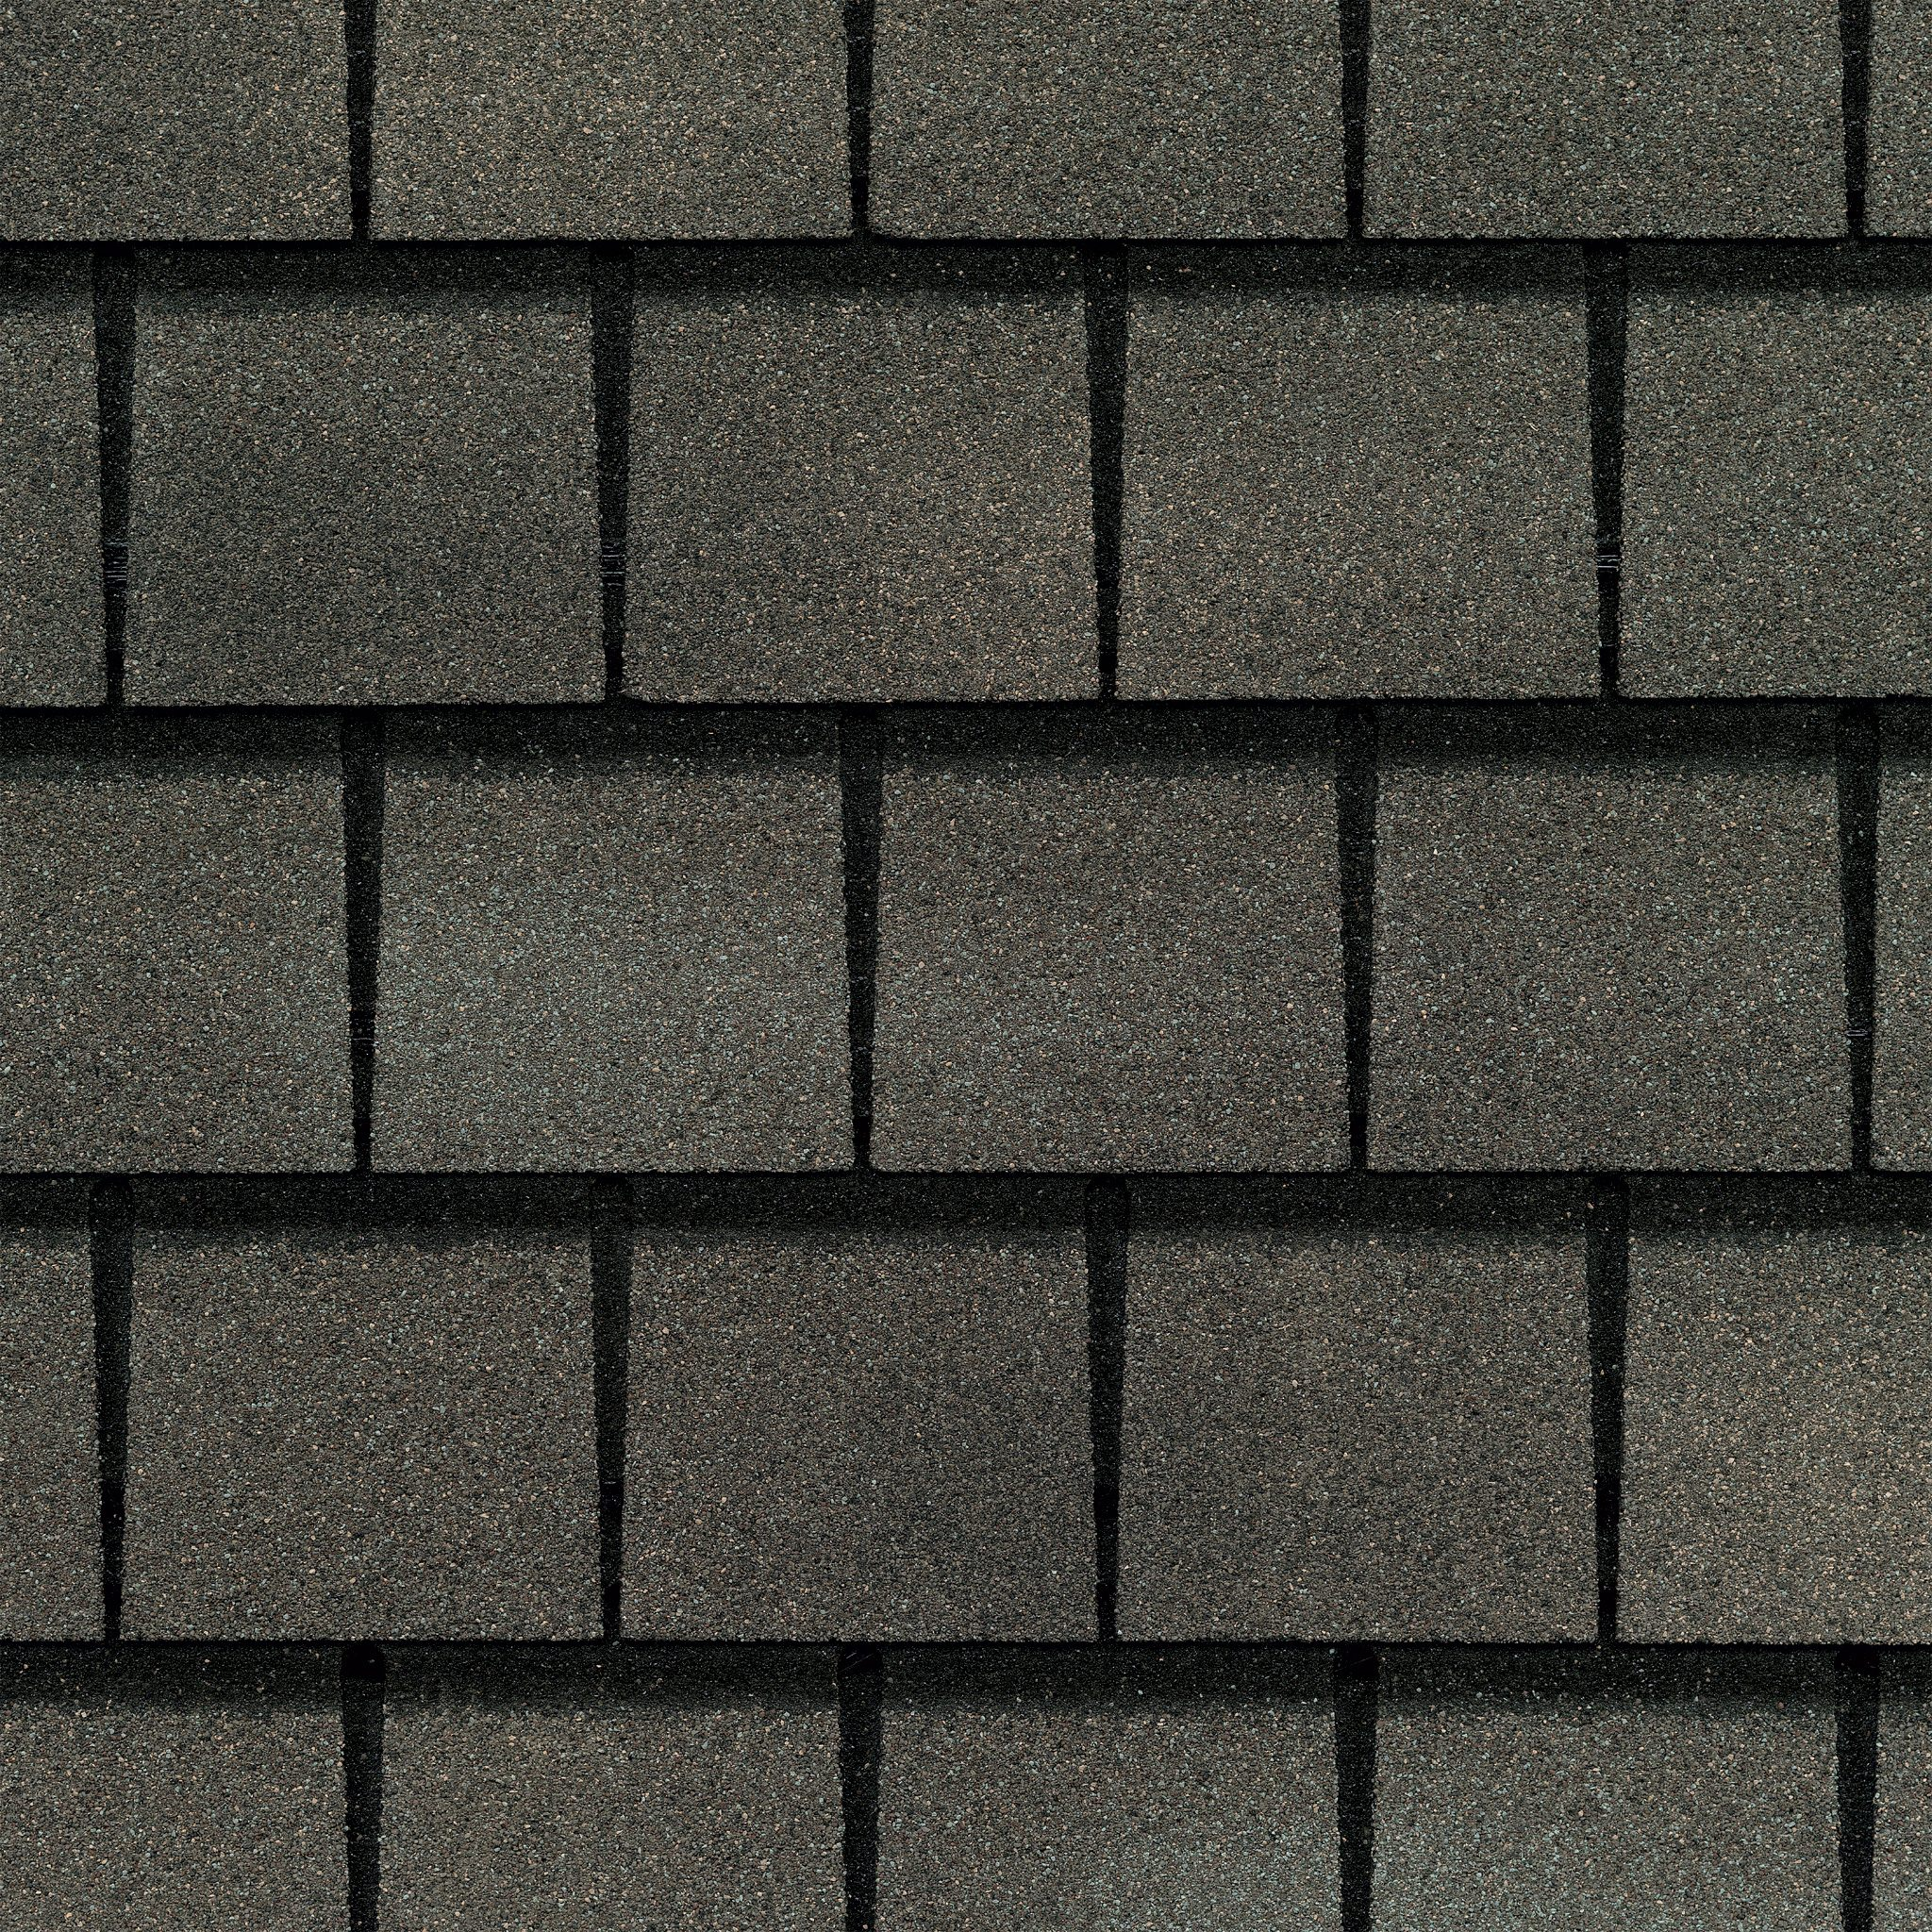 Close up photo of GAF's Slateline Weathered Slate shingle swatch